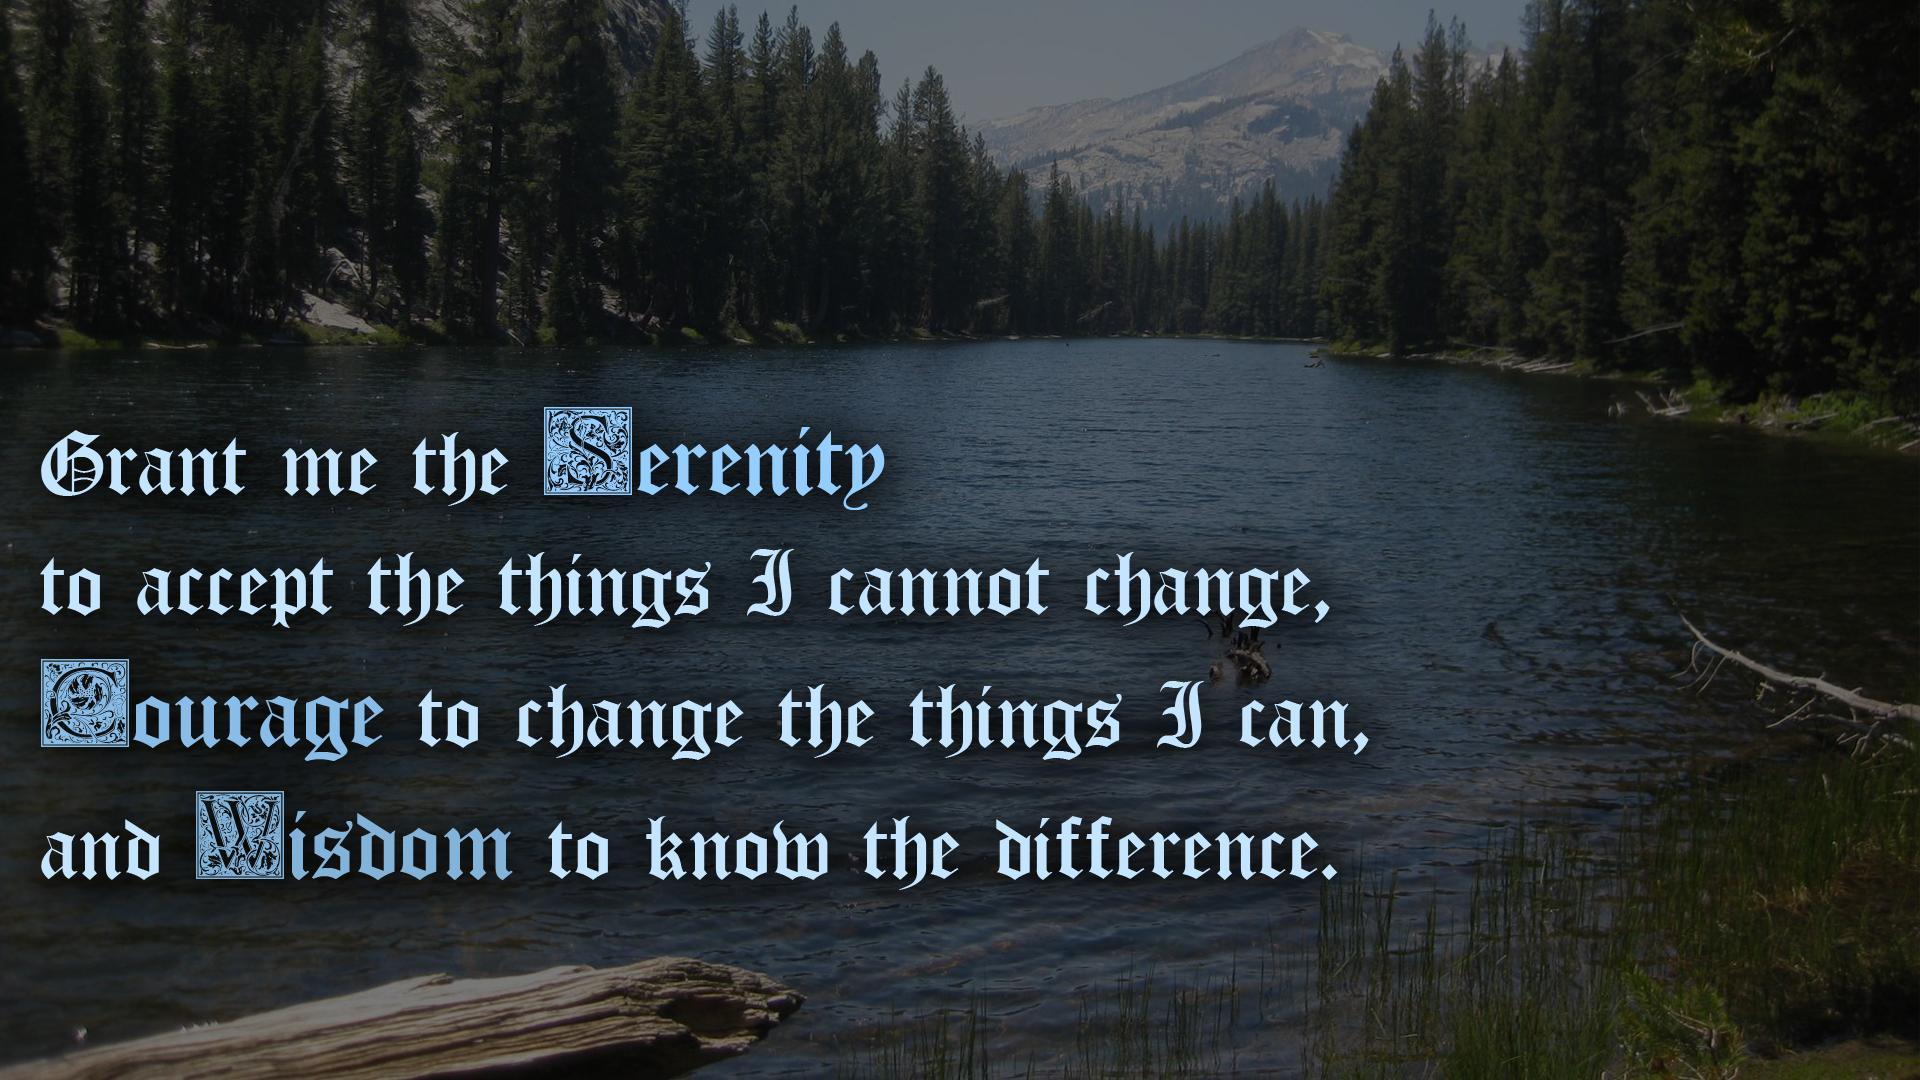 Serenity Prayer Backgrounds 1920x1080